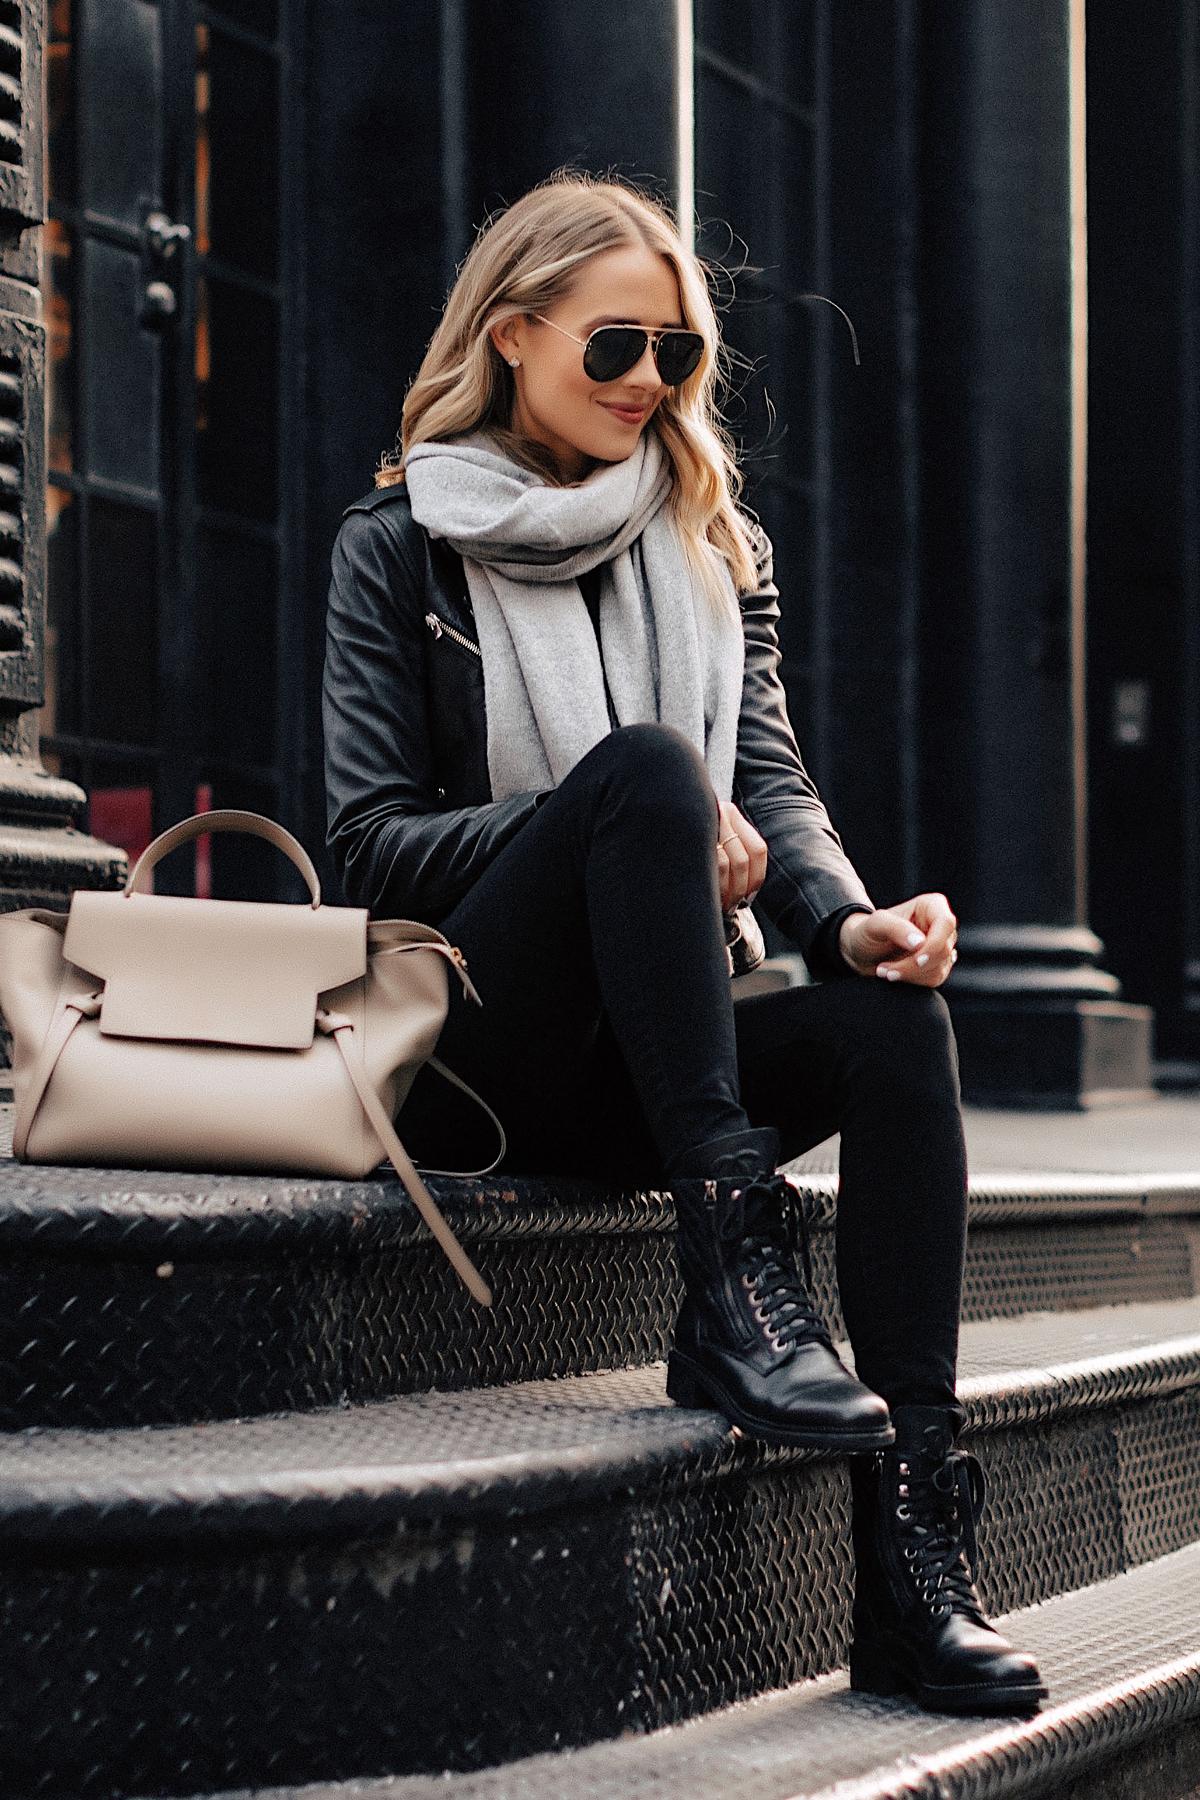 Fashion Jackson Wearing Black Leather Jacket Black Skinny Jeans Chanel Combat Boots Grey Scarf Celine Mini Belt Bag NYC Street Style